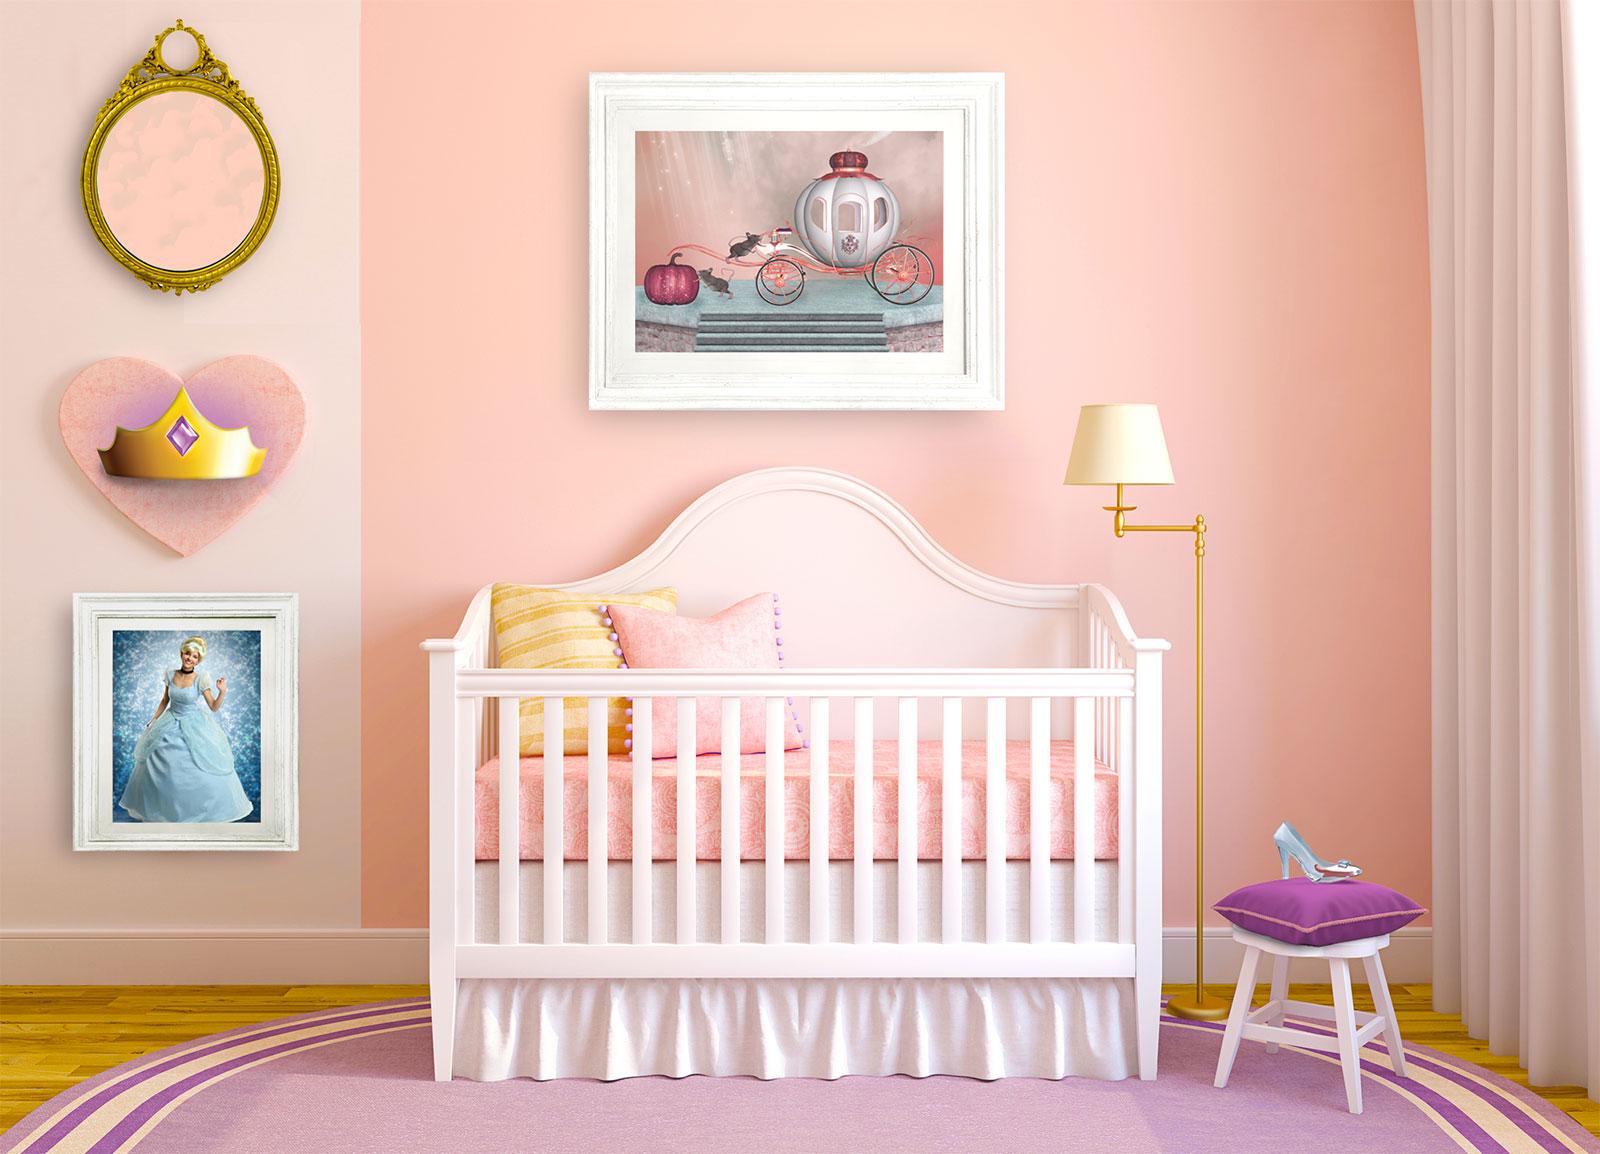 Princess And The Frog Bedroom Decor Disney Princess Nursery Decor